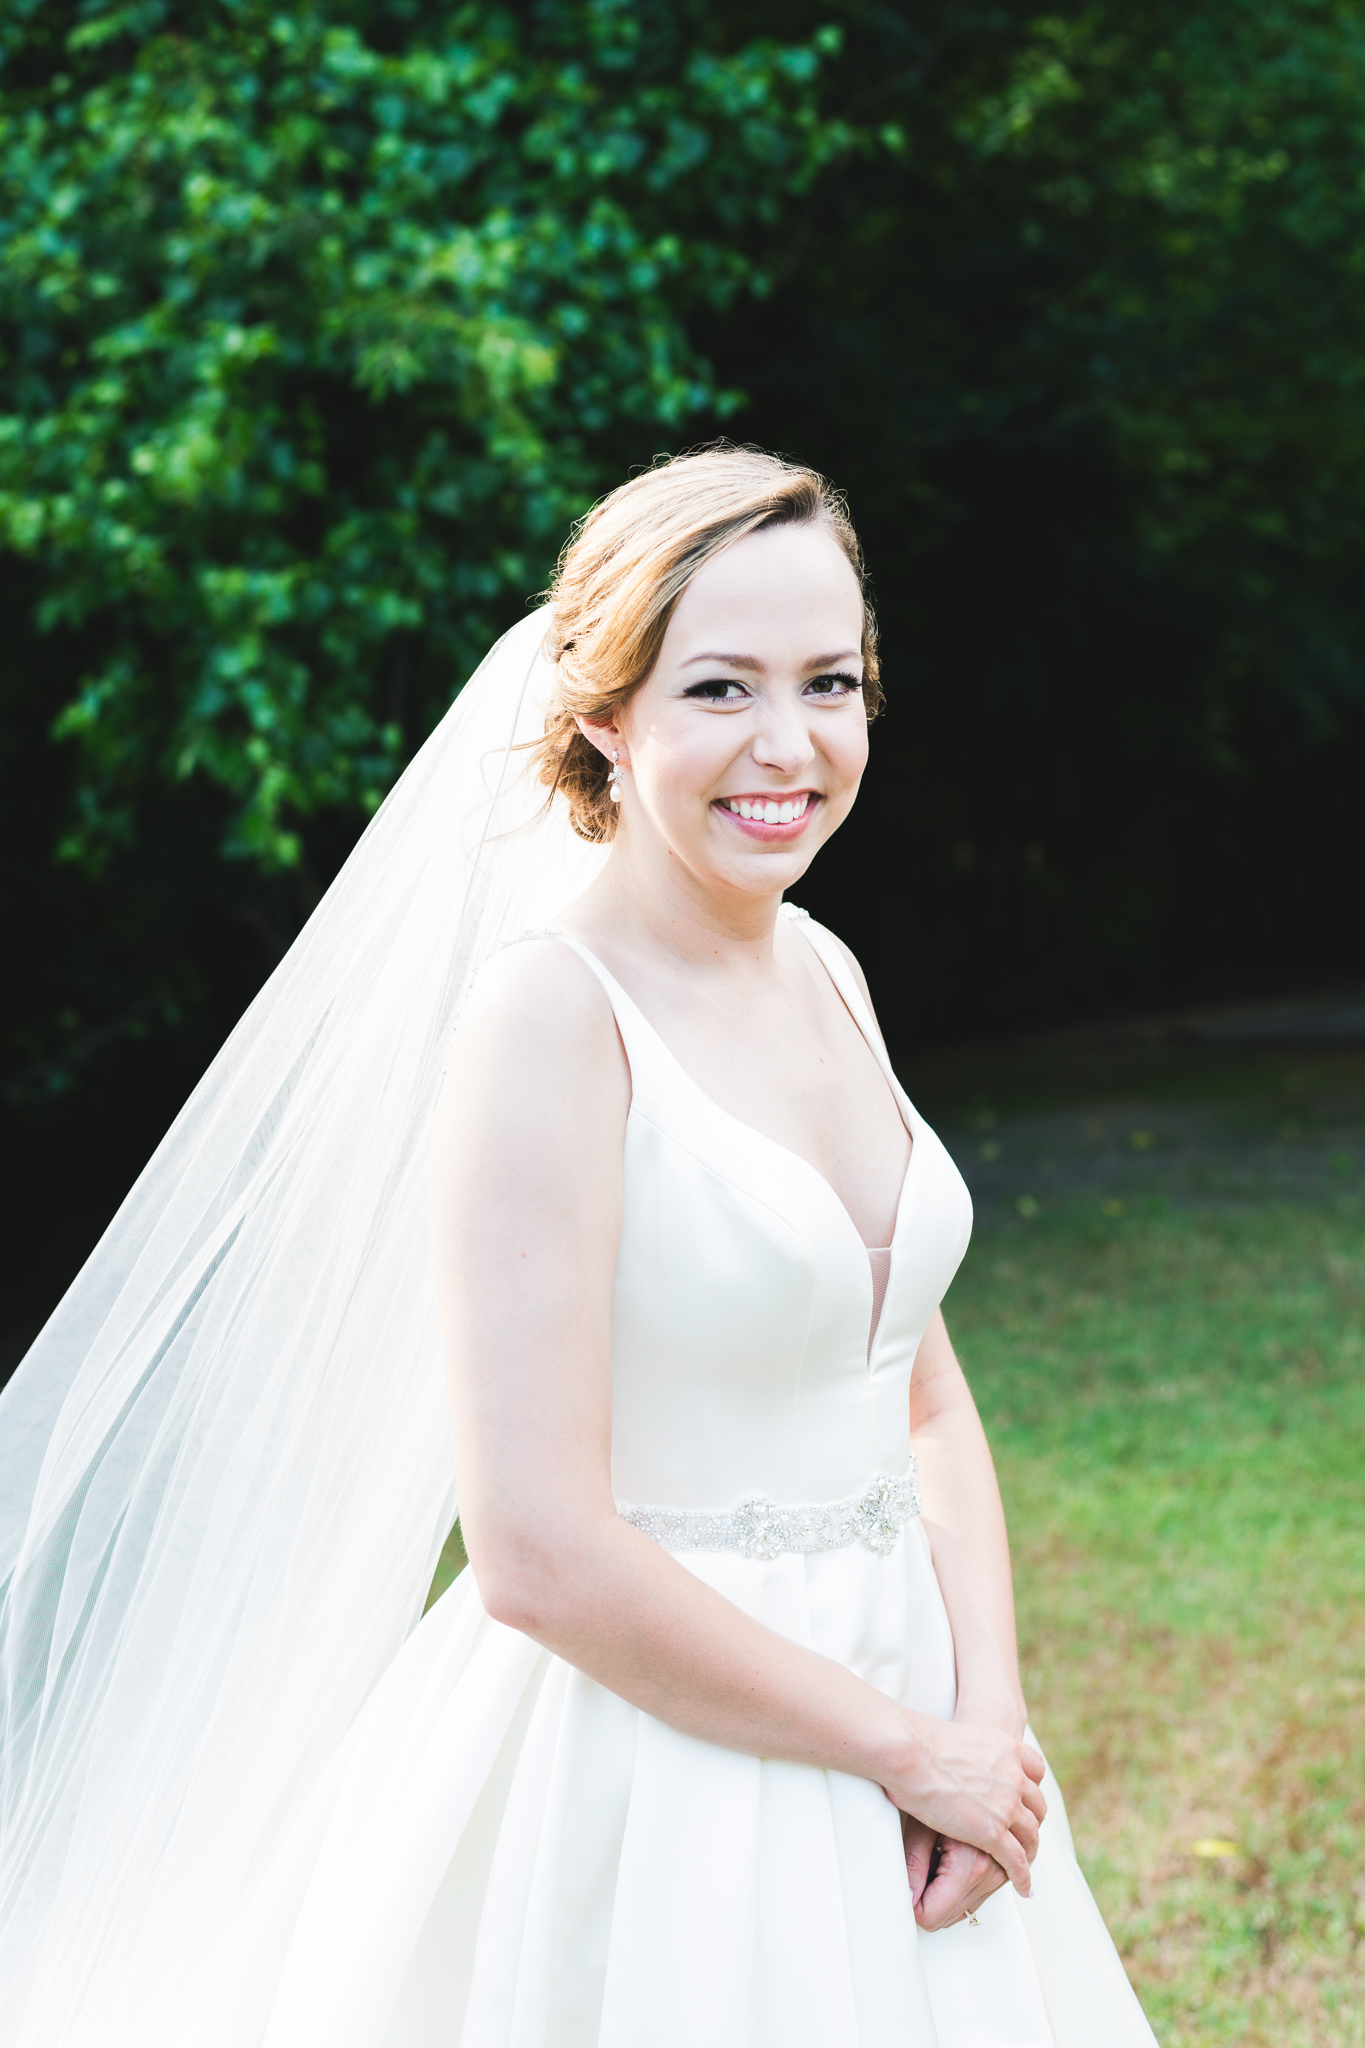 Bridals_MadisonReke_Blog-20.jpg